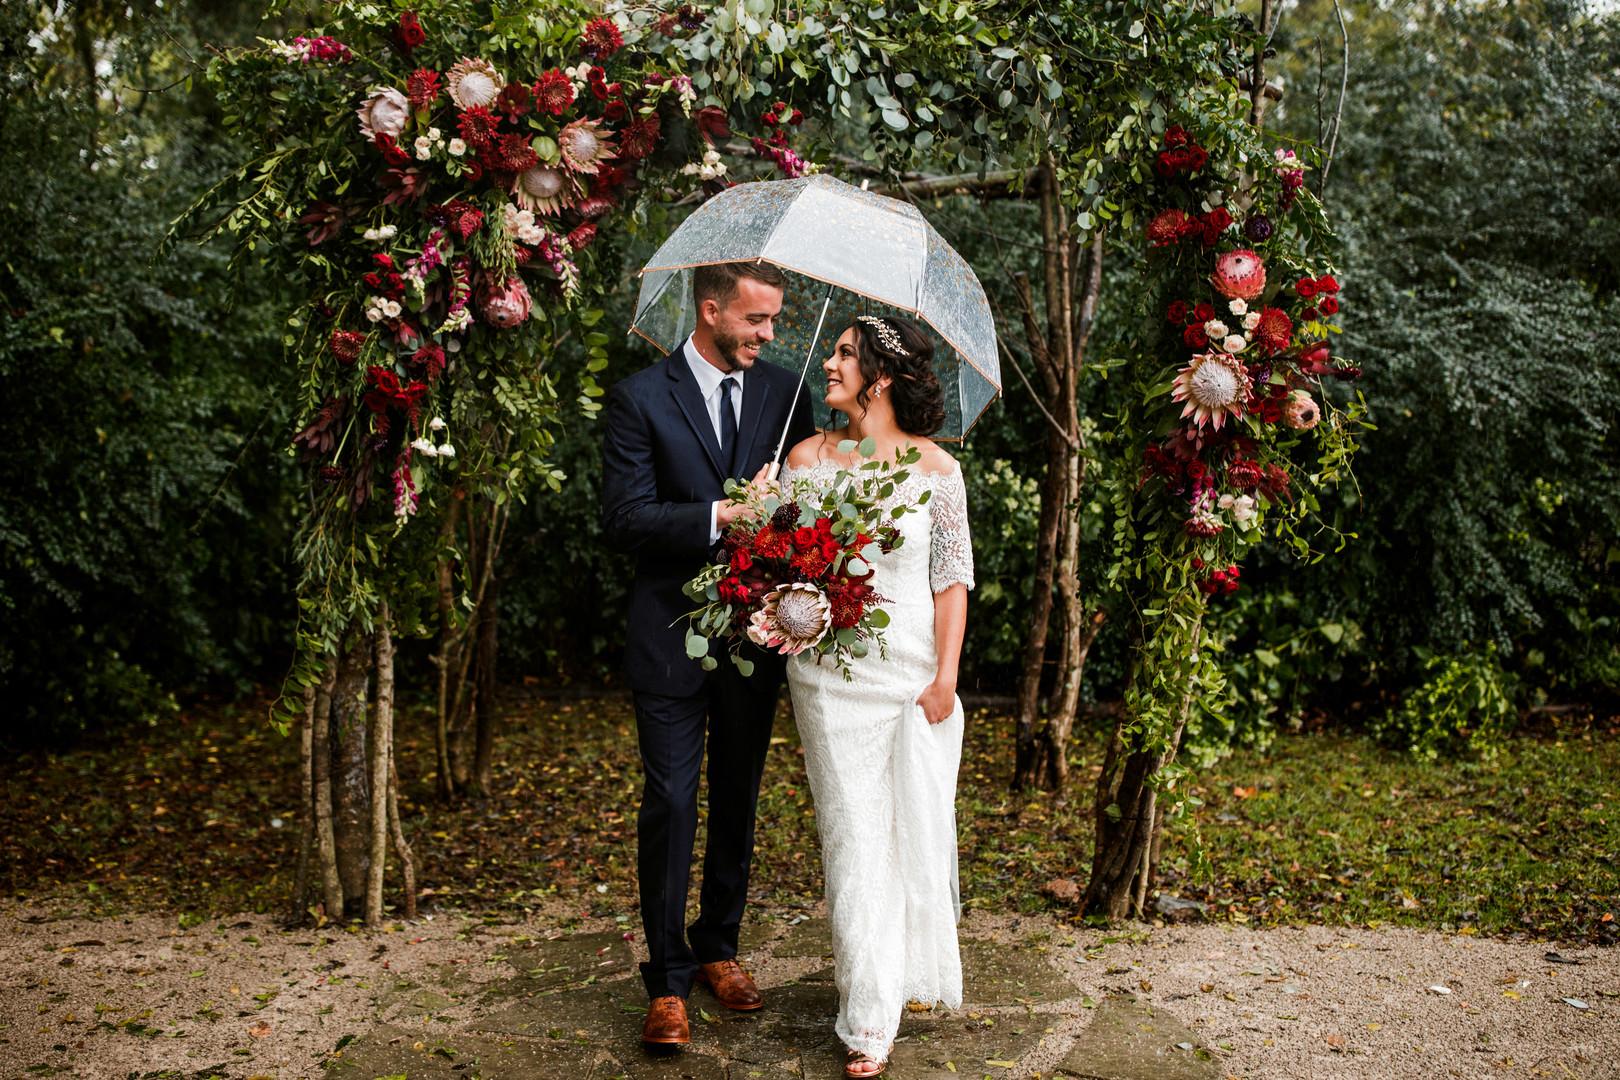 Couple under umbrella on wedding day